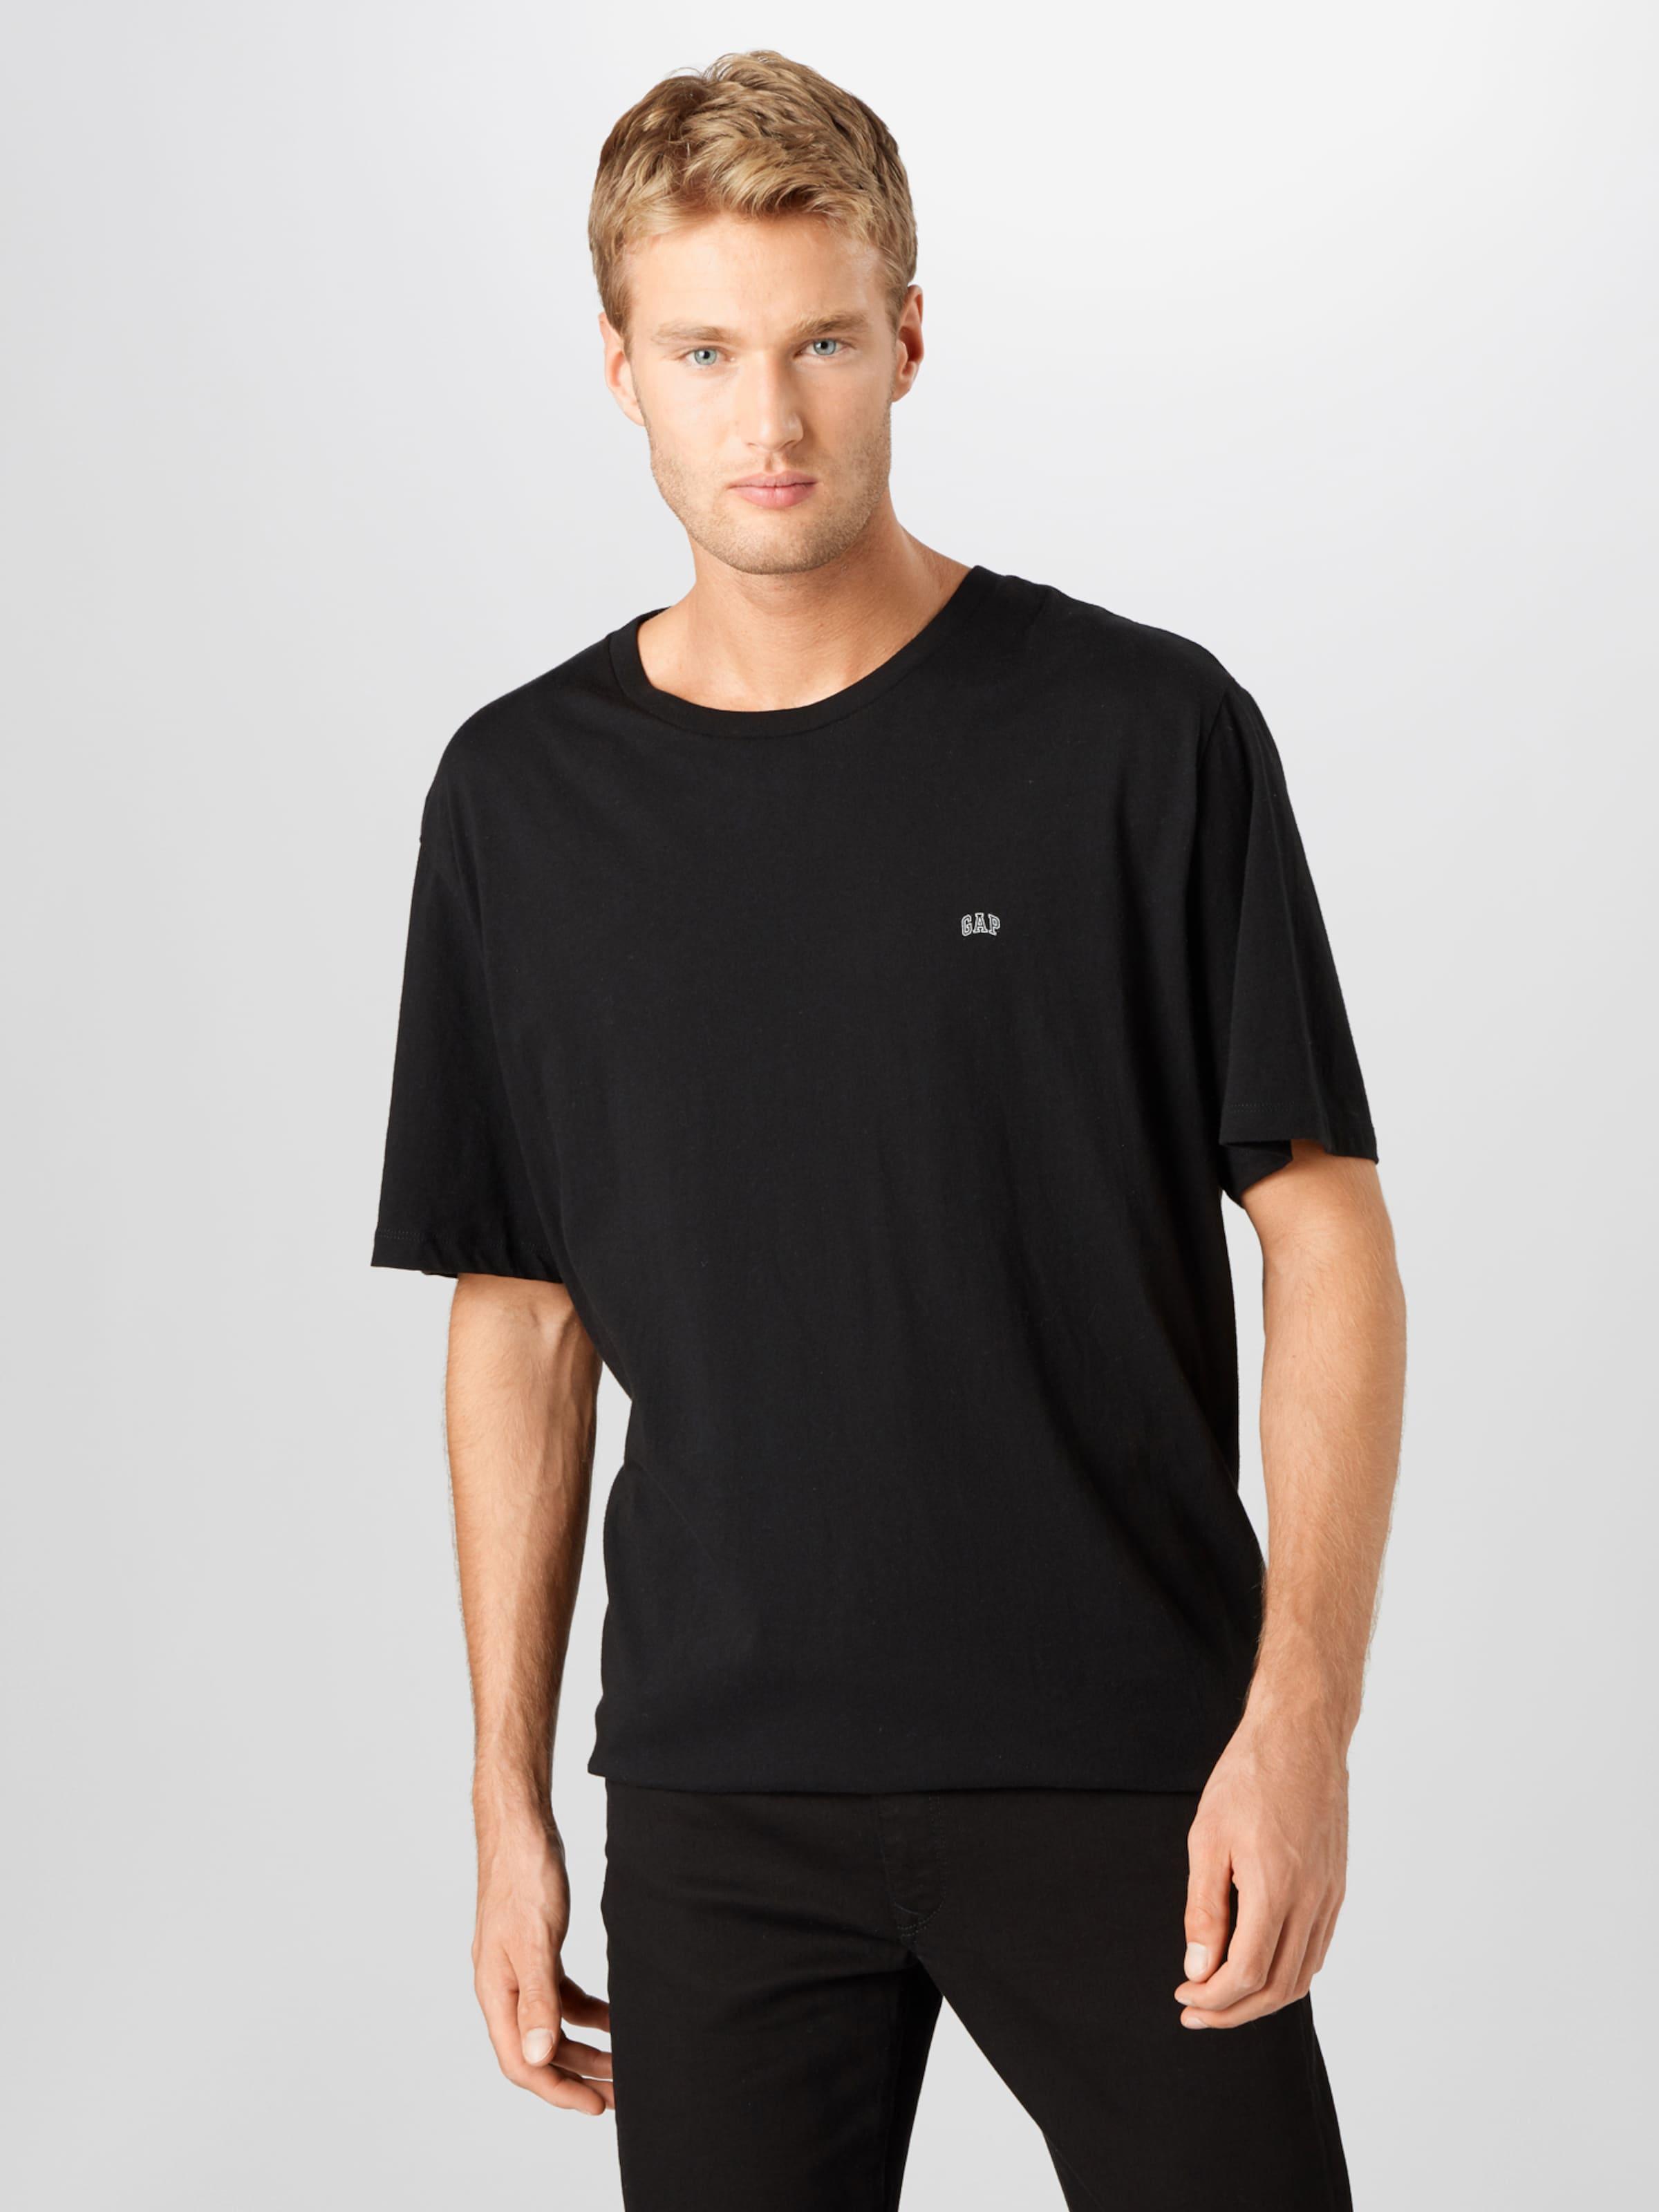 GAP T-Shirt in hellgrau / schwarz Jersey GAP3989001000001